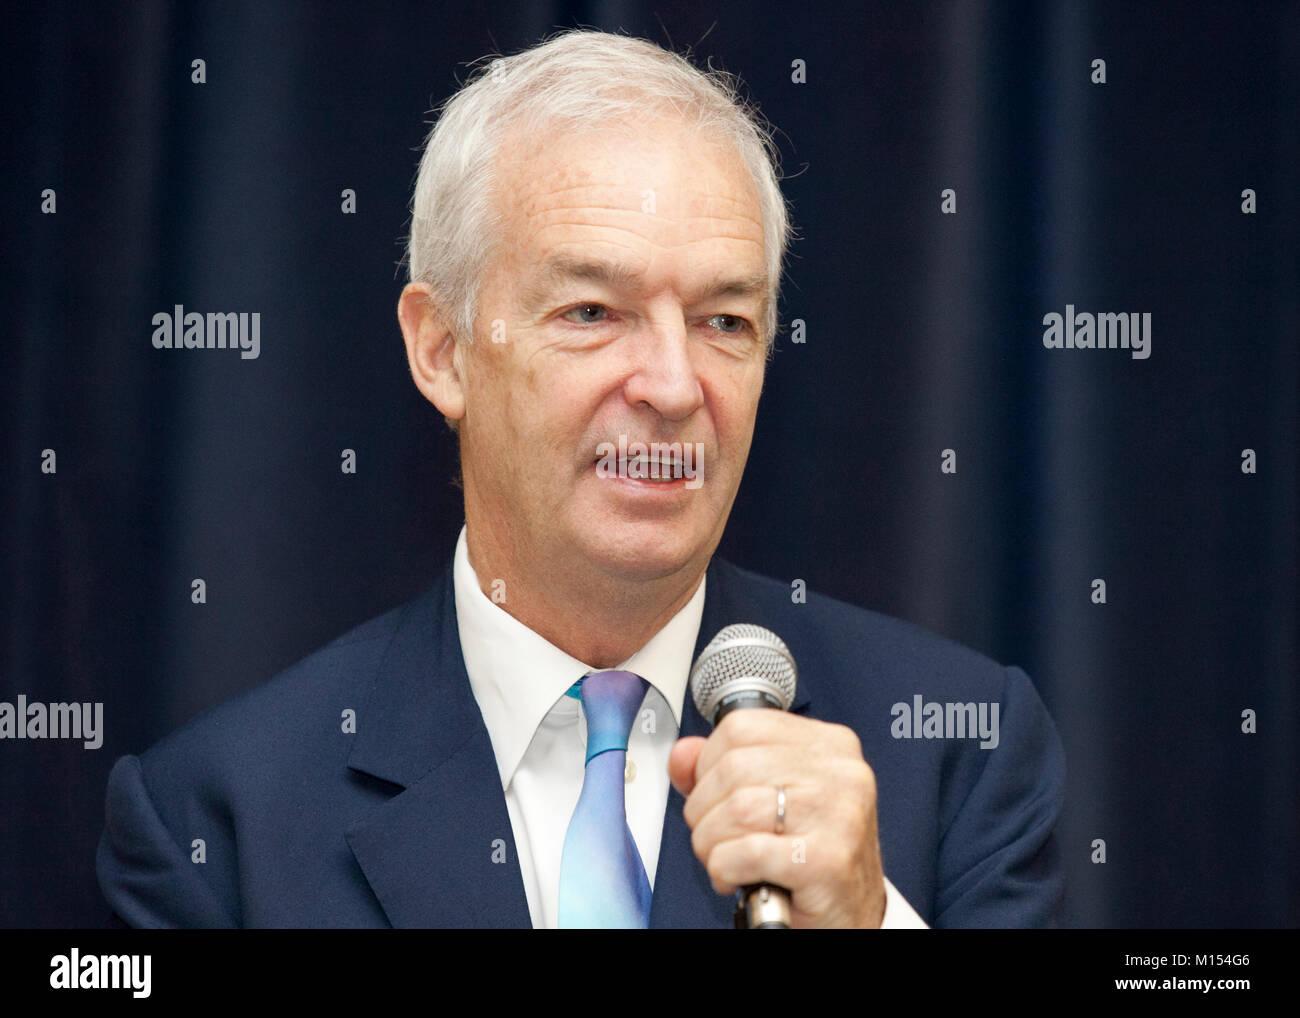 Evgeny Kiselev, TV presenter: photo, biography and personal life 60